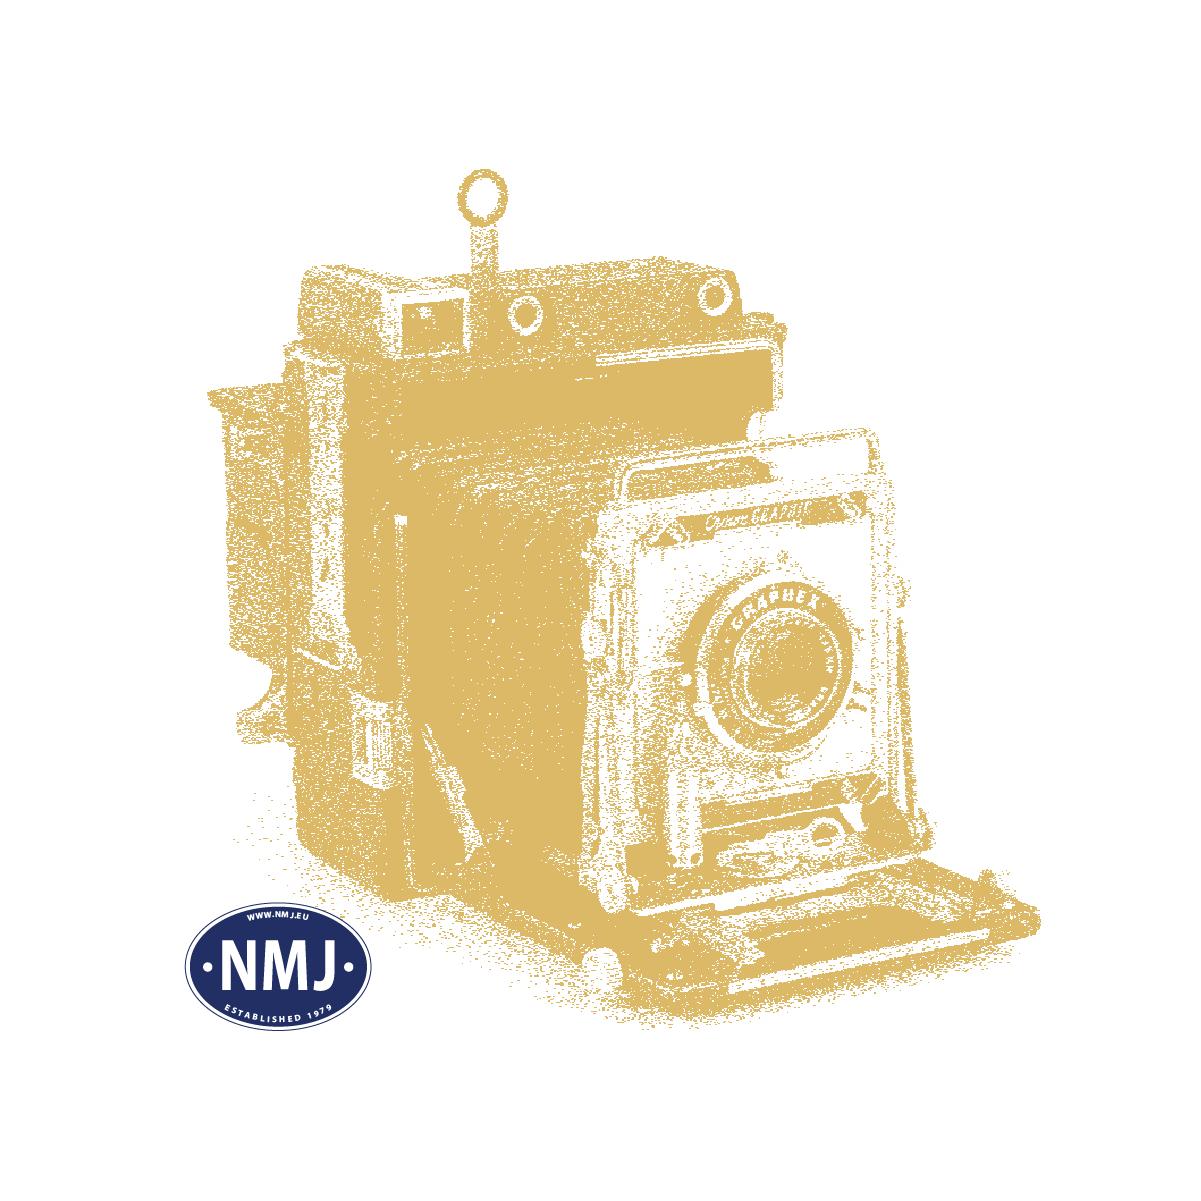 NMJT133.301 - NMJ Topline NSB BF10 21514, Nydesign